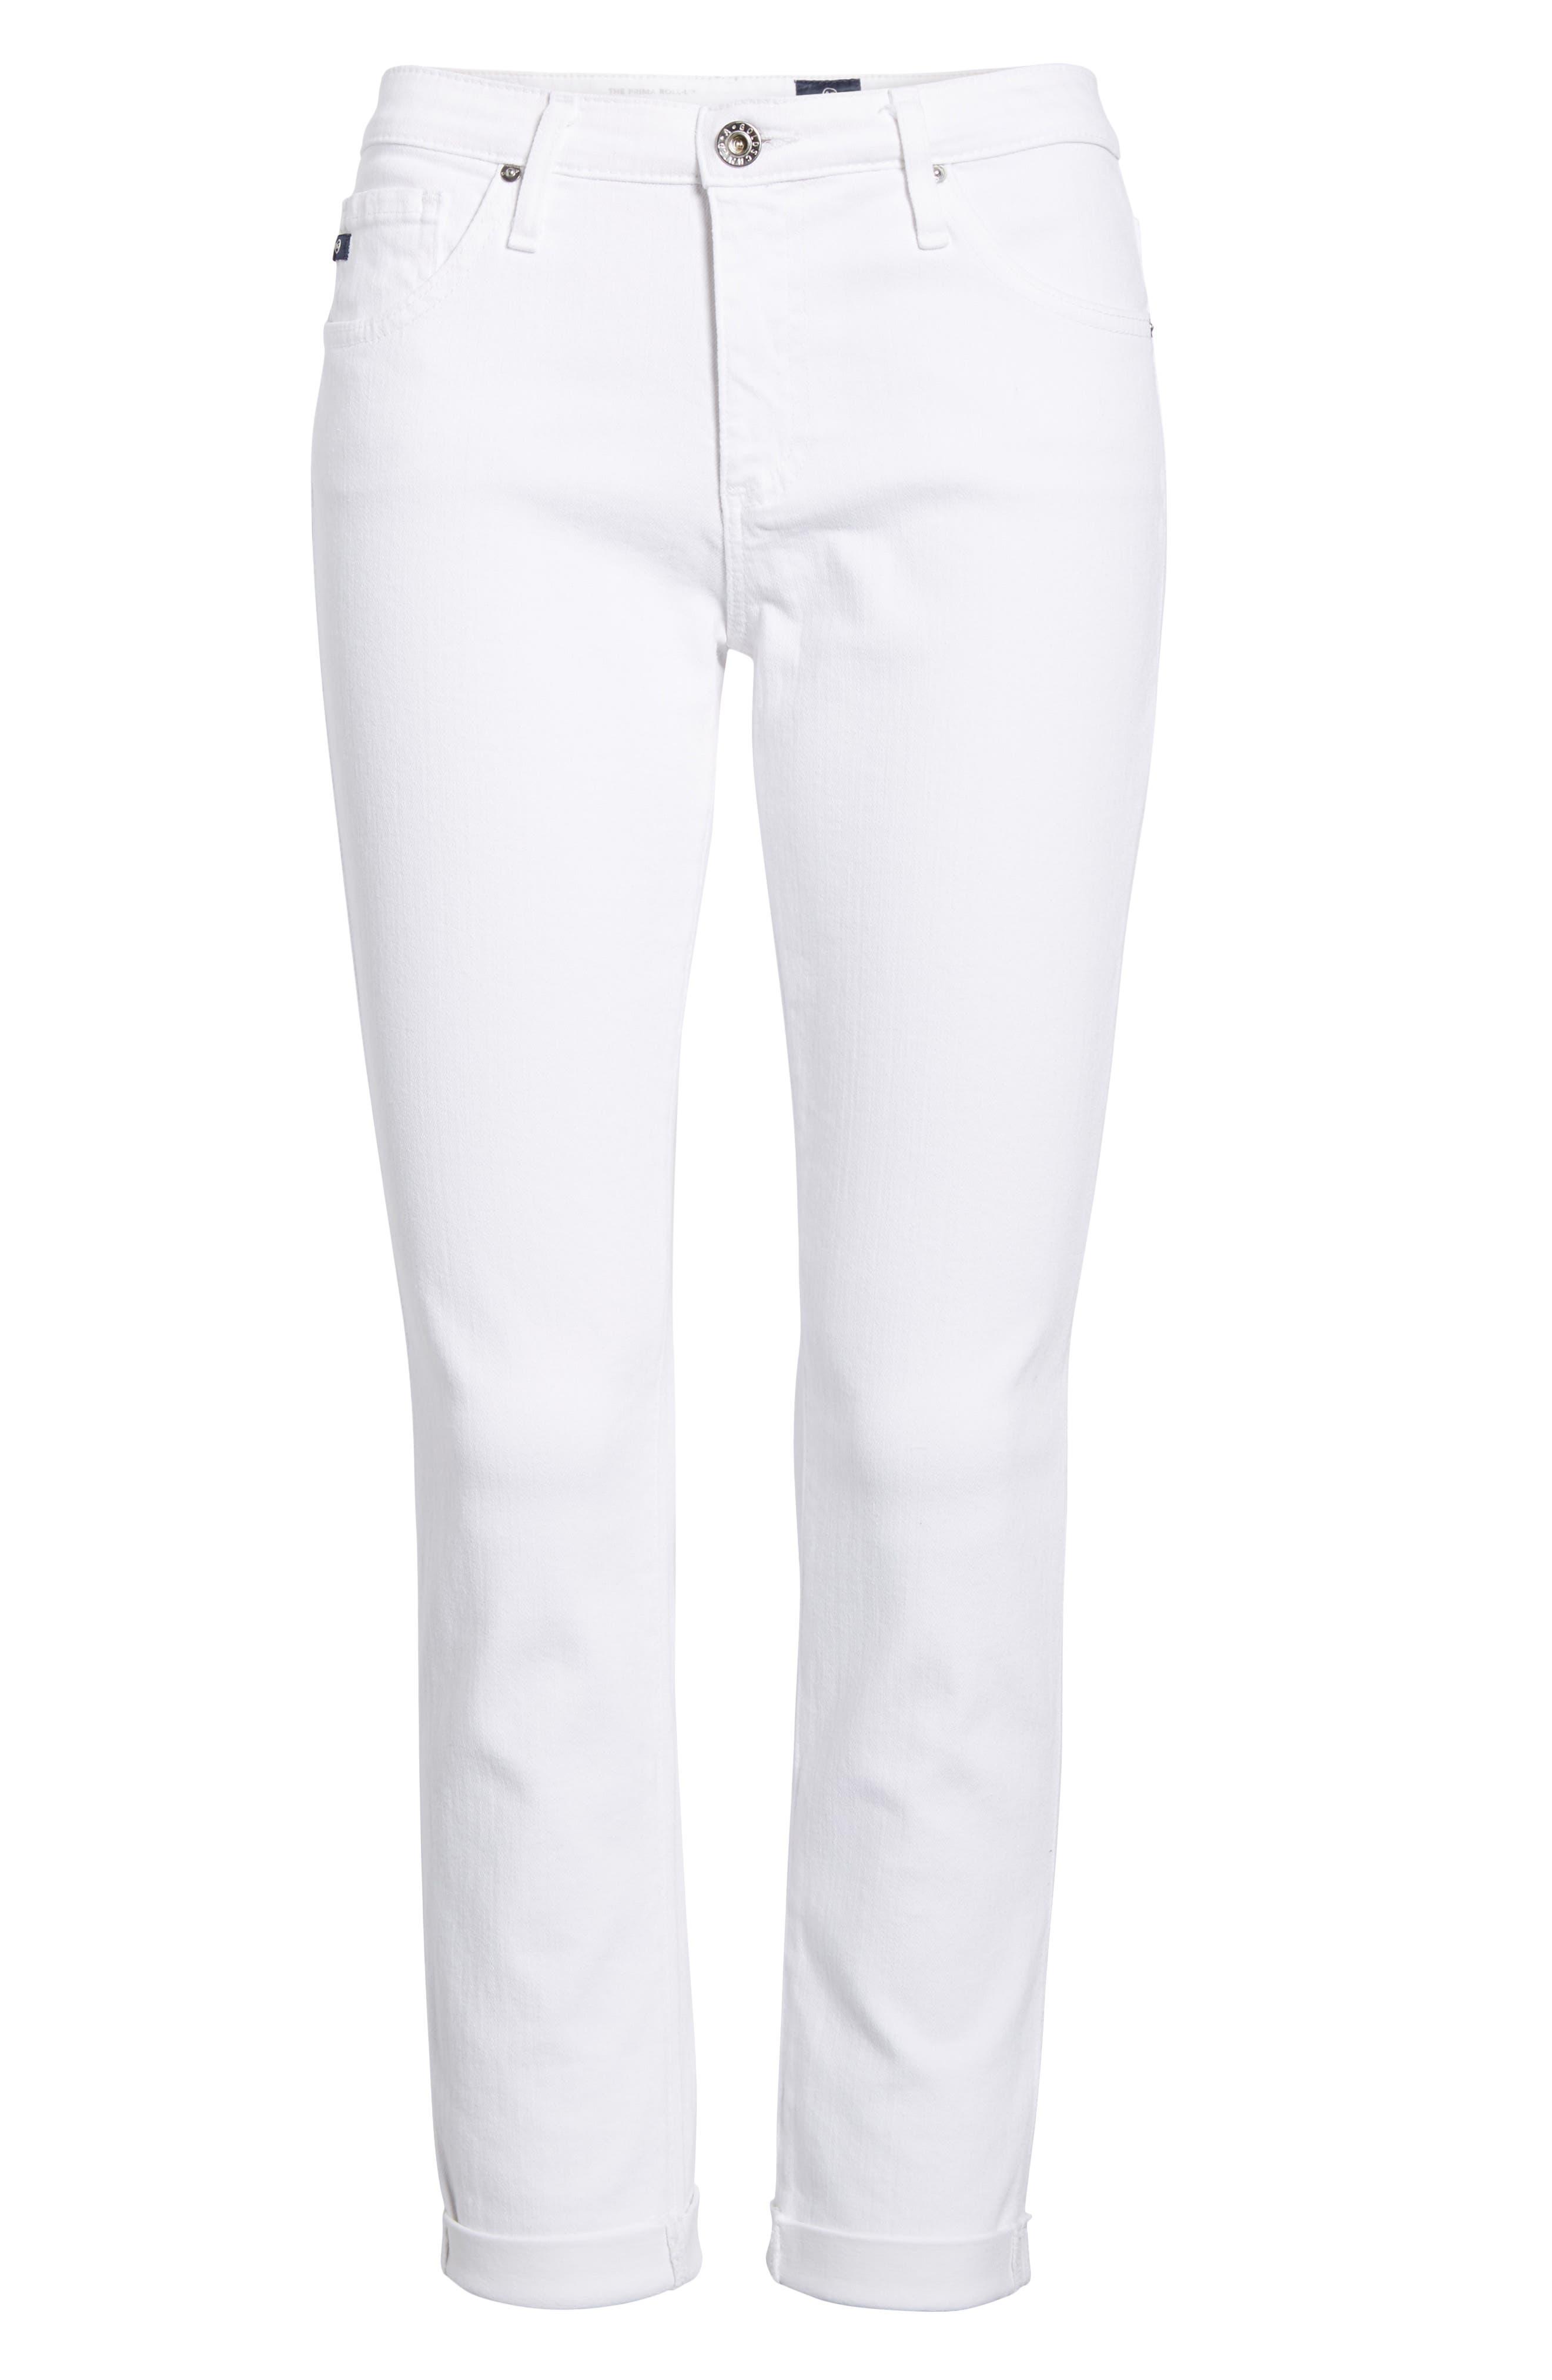 Prima Roll-Up Skinny Jeans,                             Alternate thumbnail 7, color,                             White